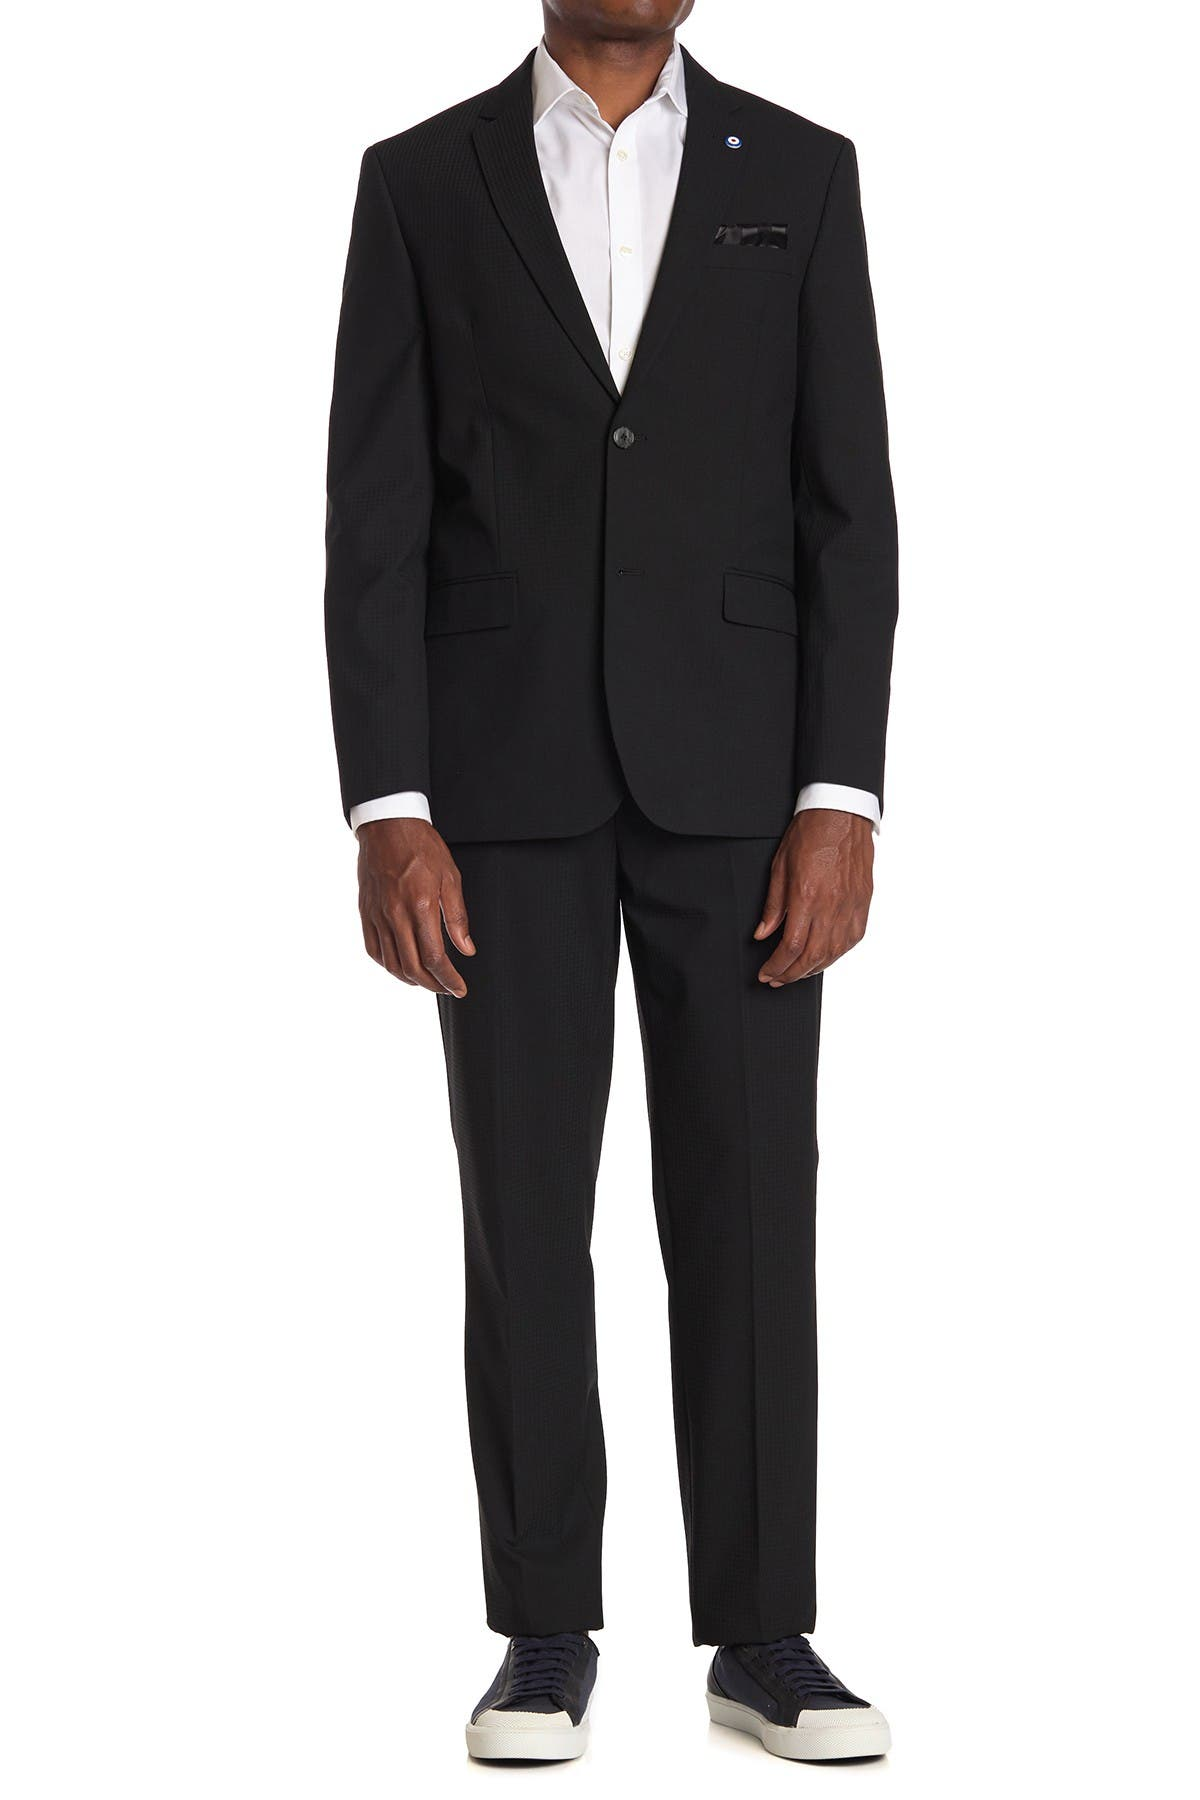 Image of Ben Sherman Black Solid Slim Fit 2-Piece Suit